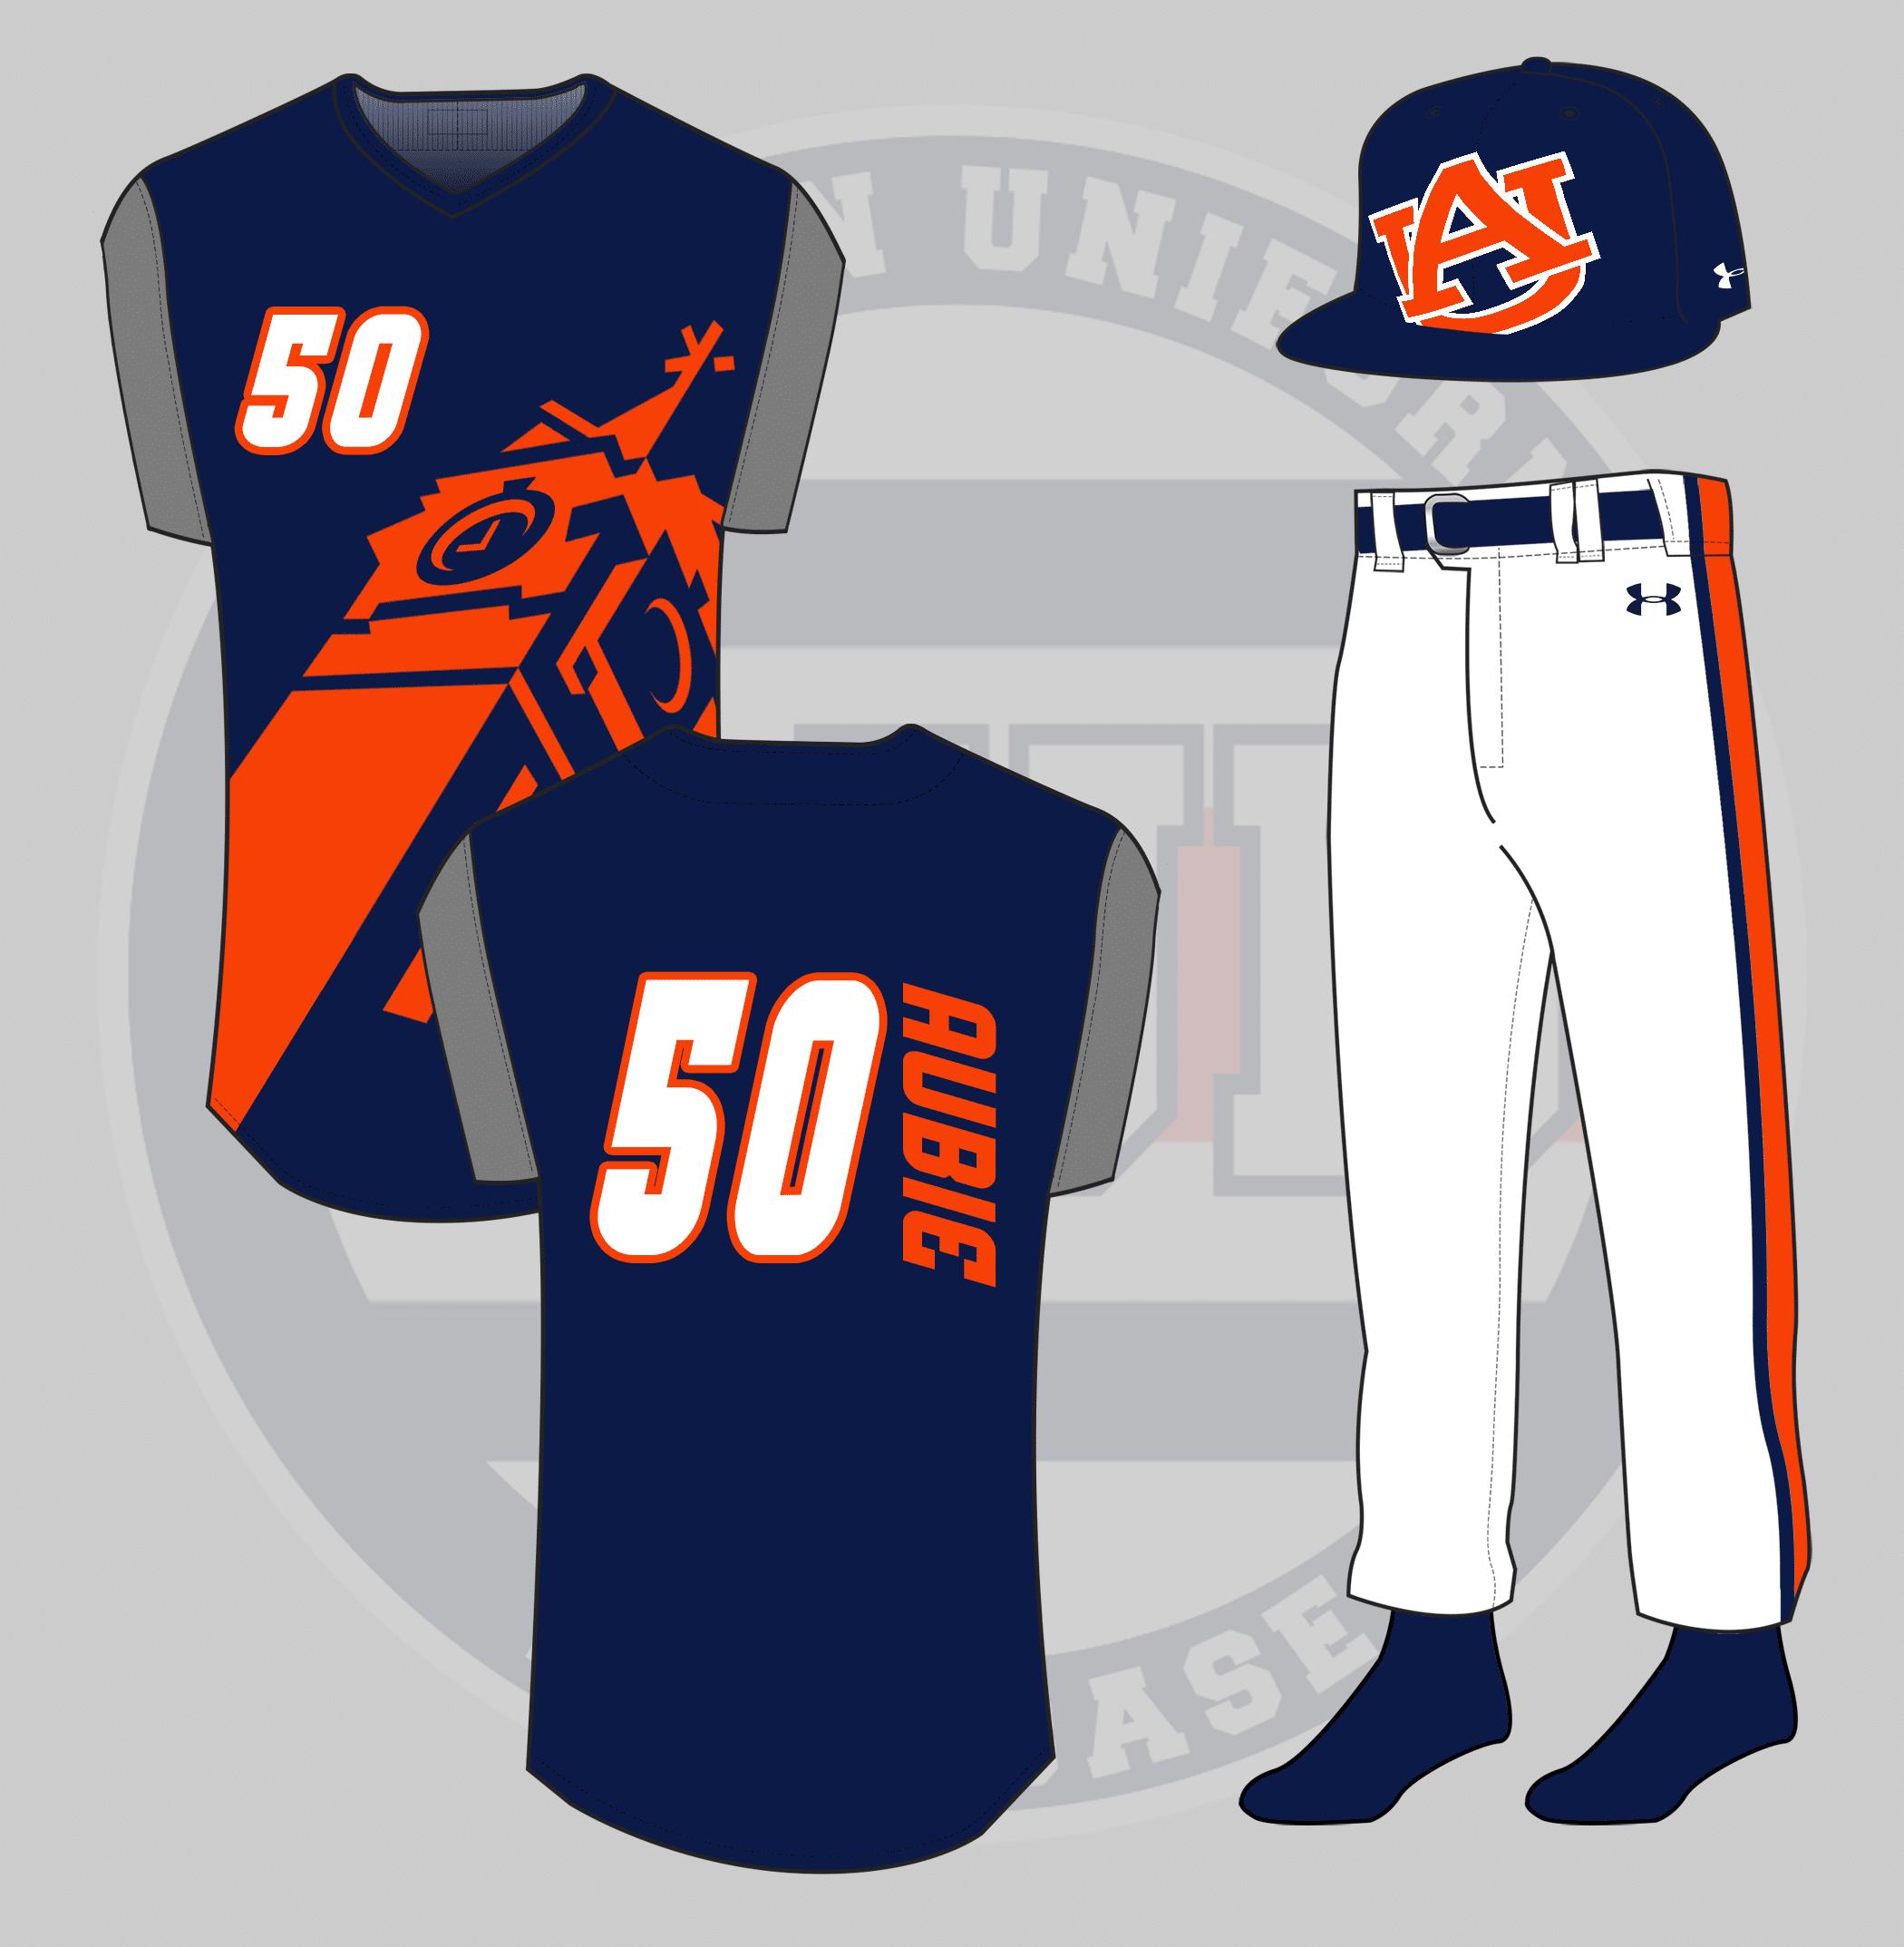 buy popular 80a6f 1ab78 Crazy Auburn Concept Uniforms - Round 5 - Auburn Uniform ...